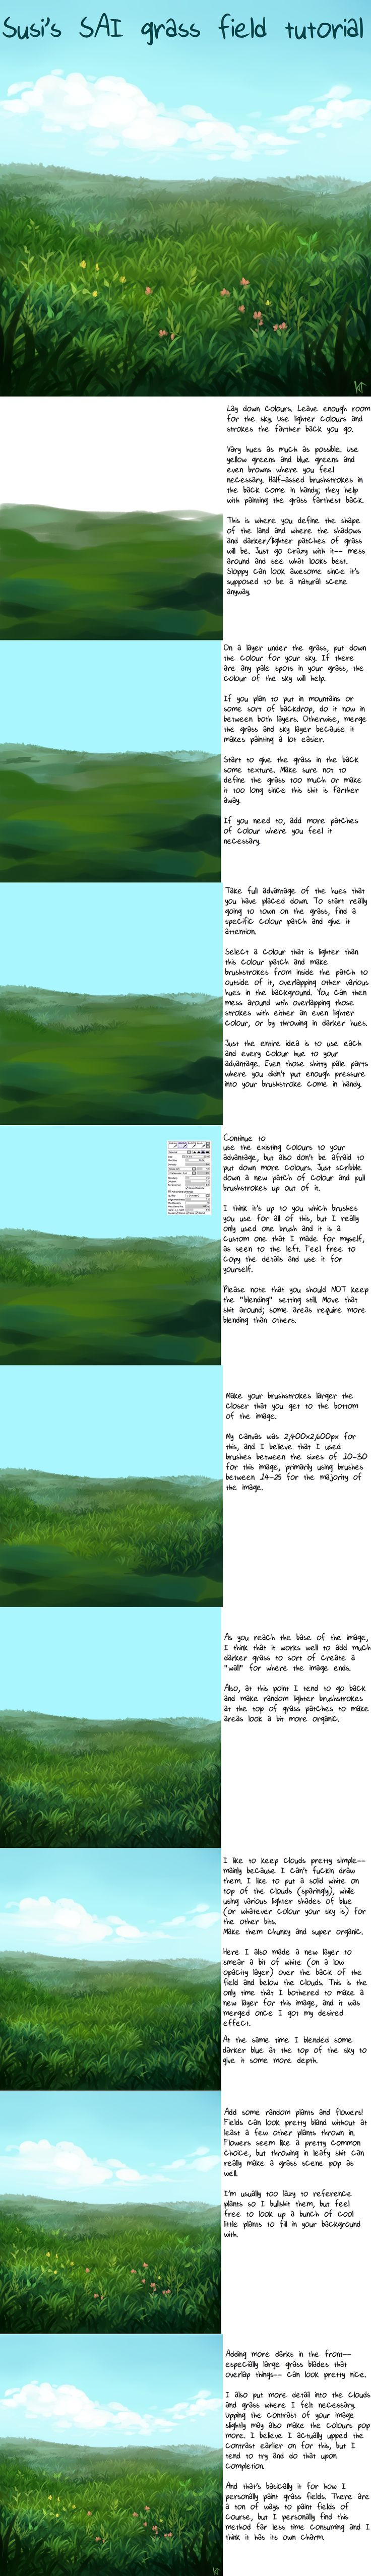 SAI Grass Field Tutorial by Susiron.deviantart.com on @deviantART